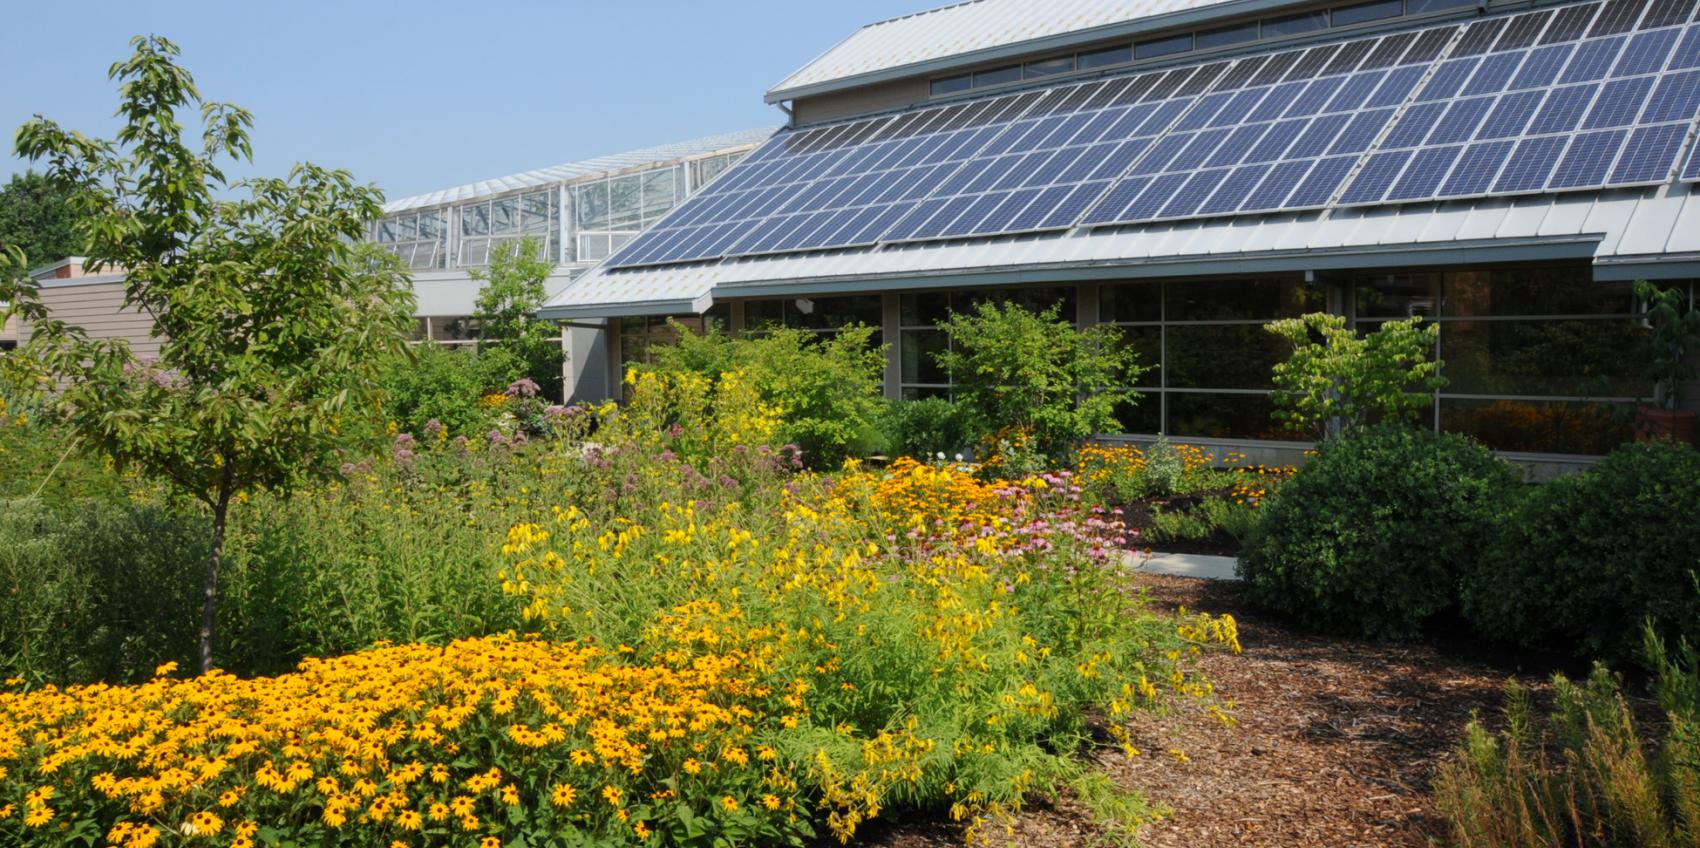 cincinnati zoo & botanical garden | american public gardens